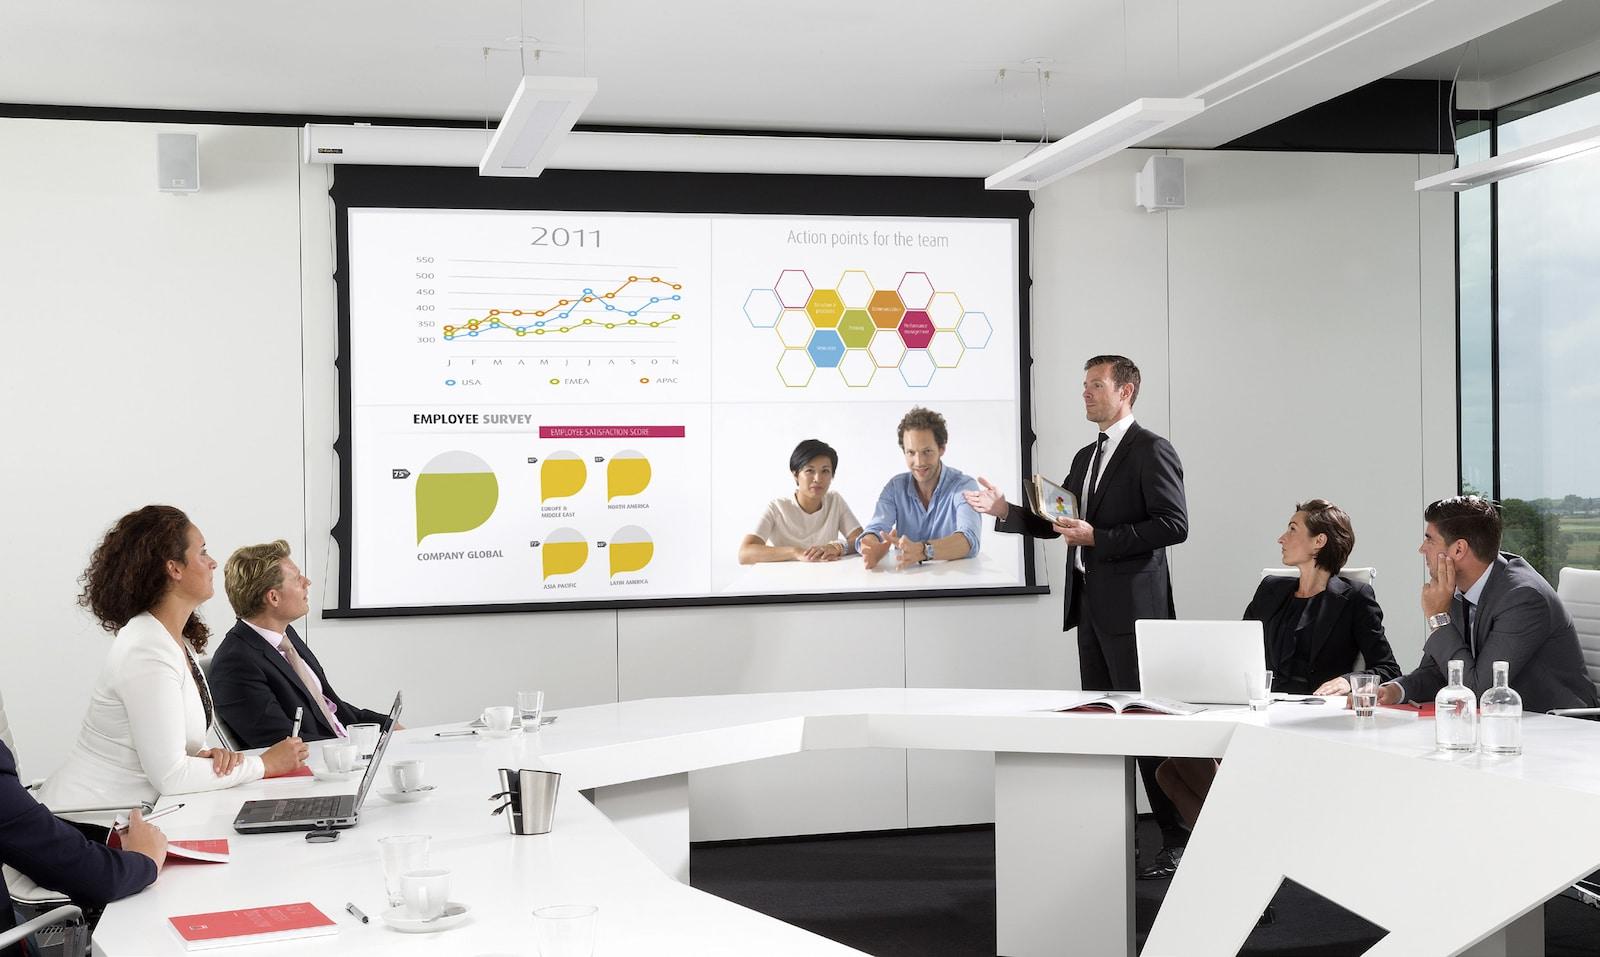 Presentacion en Inglés para empresas